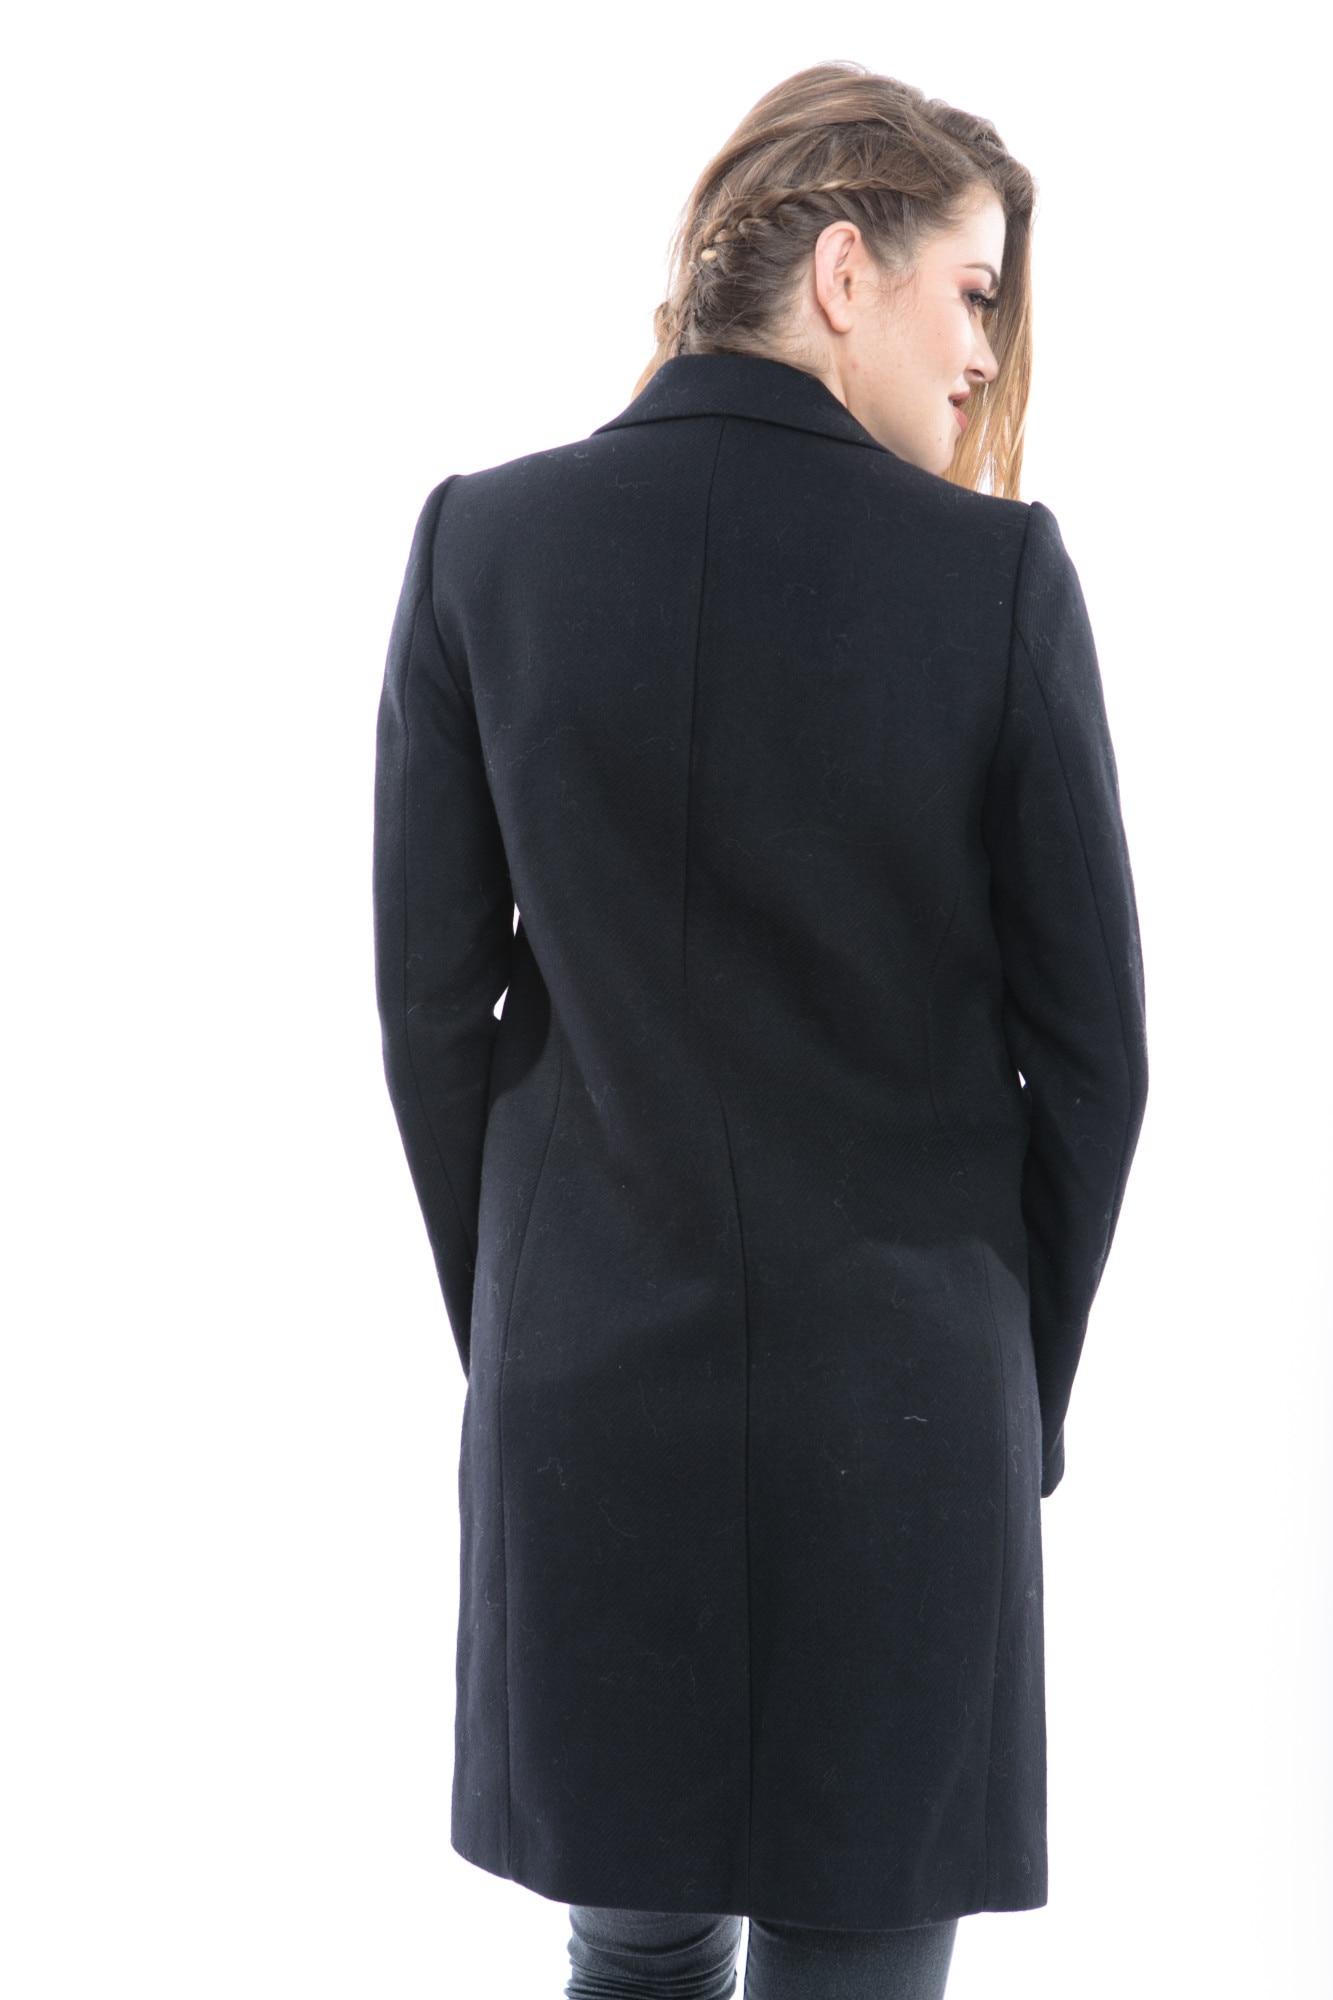 Női kabát a Zara, piros, méret XS eMAG.hu